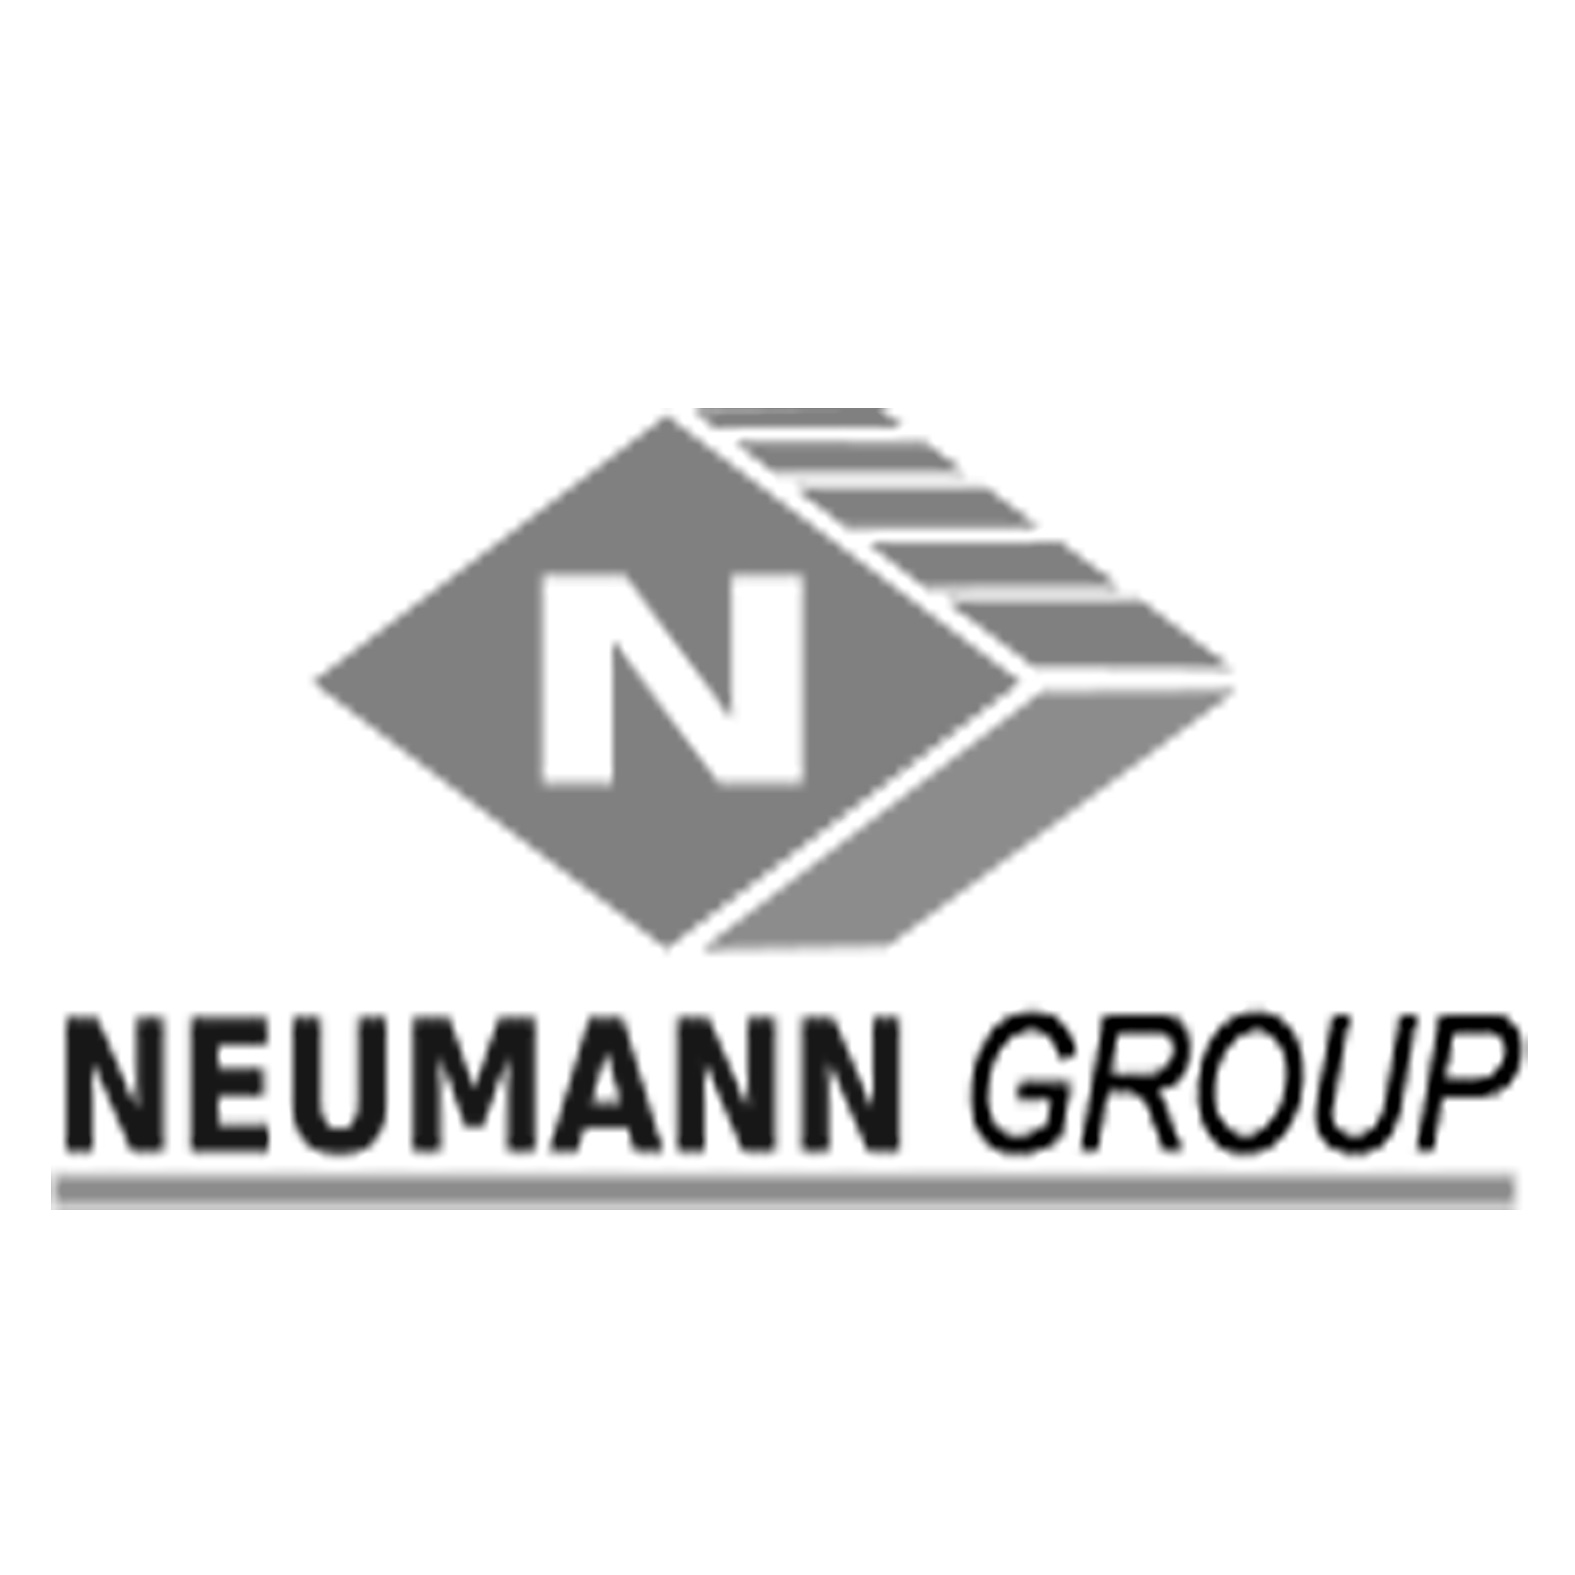 neumann group safety